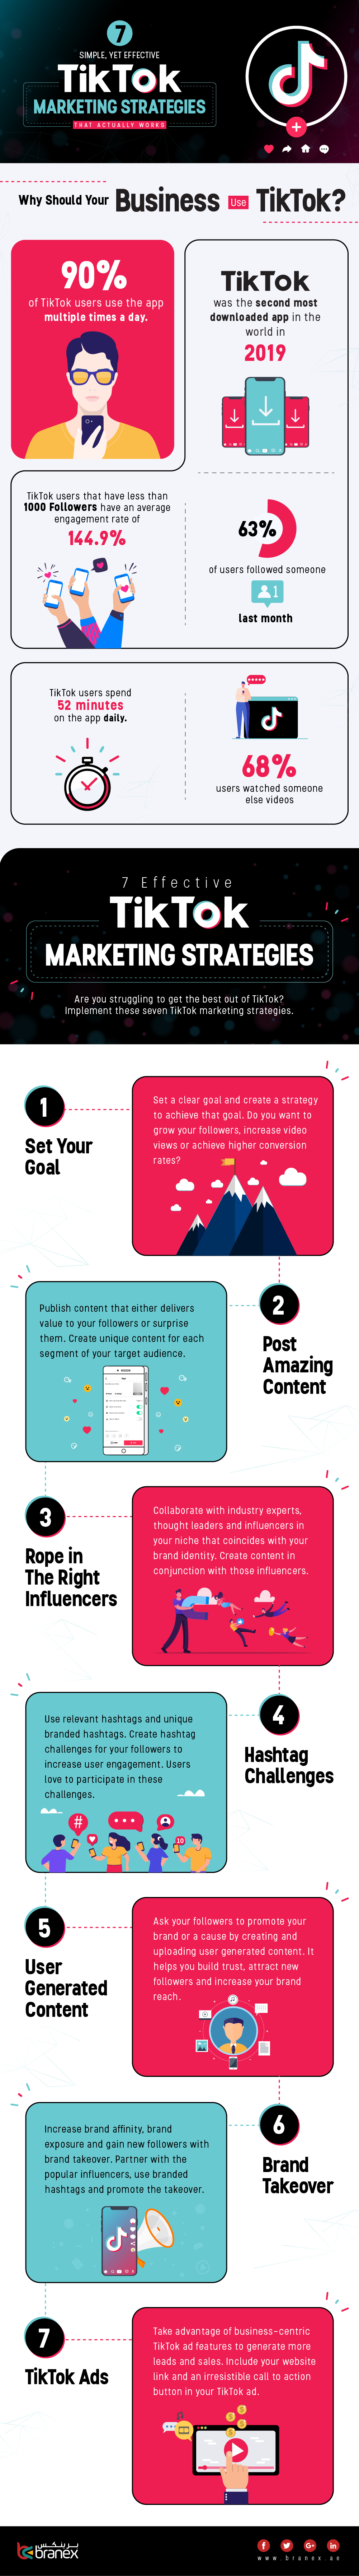 7 Simple, Yet Effective TikTok Marketing Strategies That Actually Works